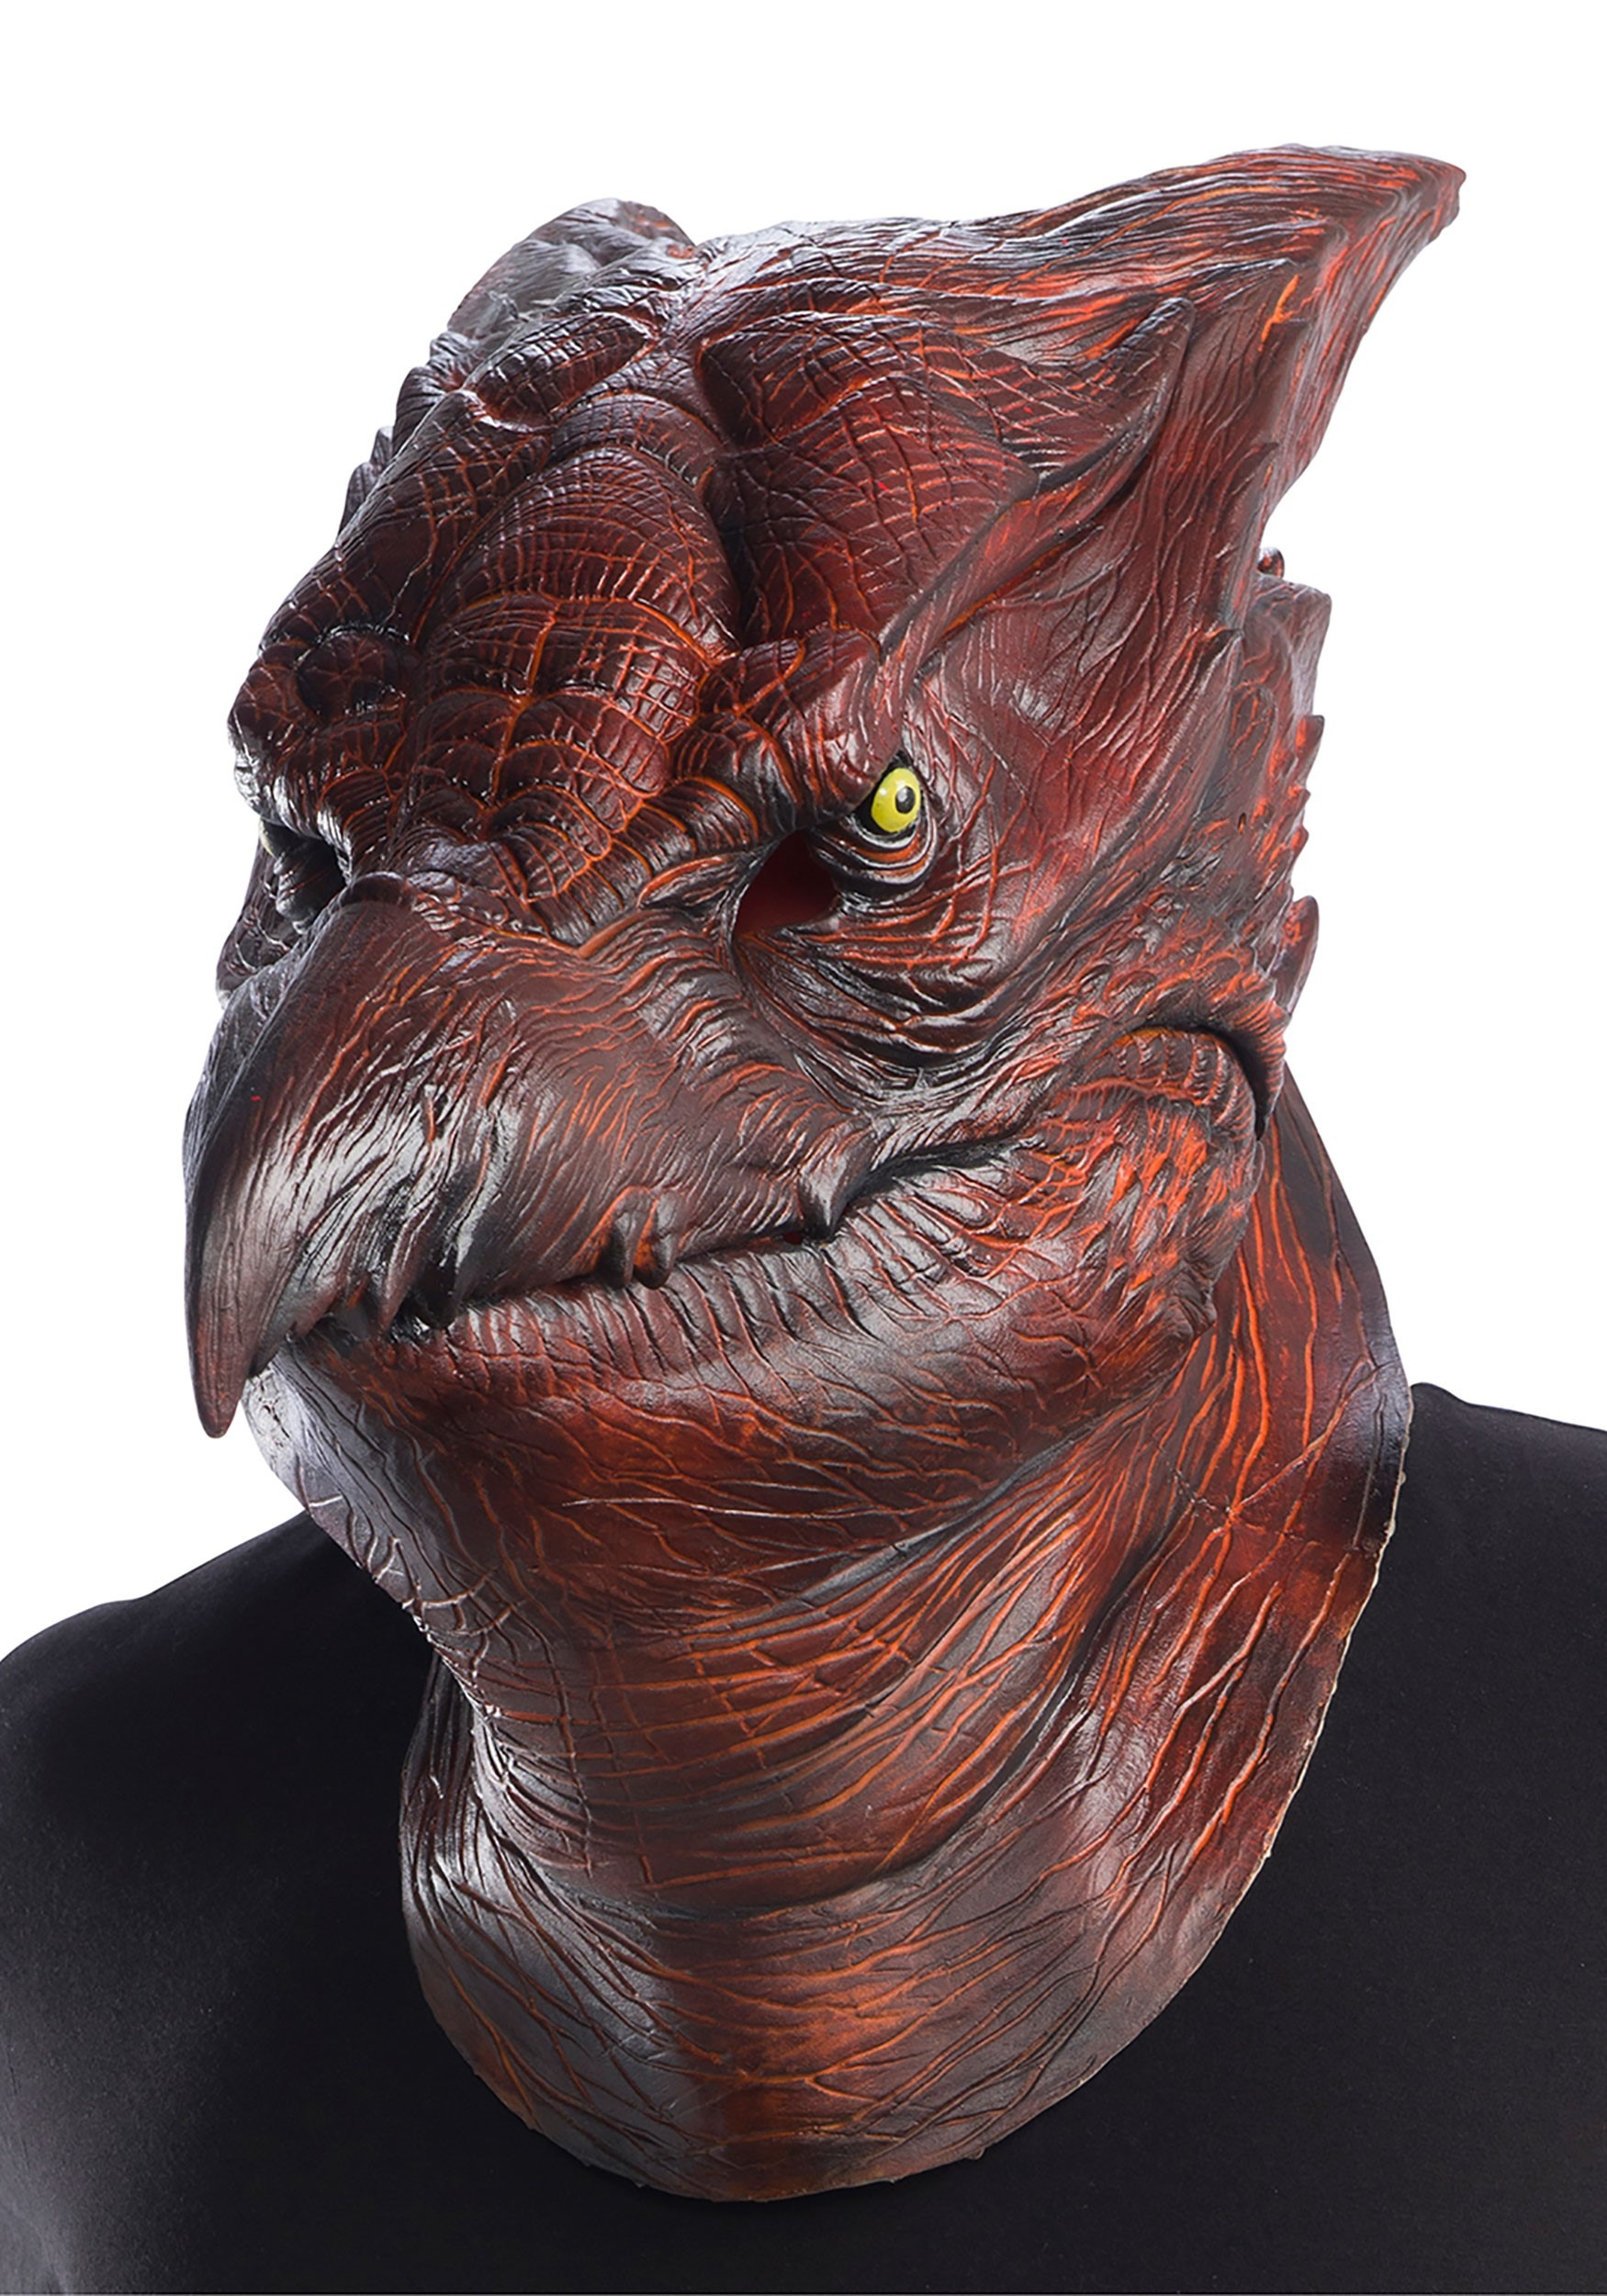 0934e550ba0 The Godzilla King of the Monsters Rodan Overhead Latex Mask